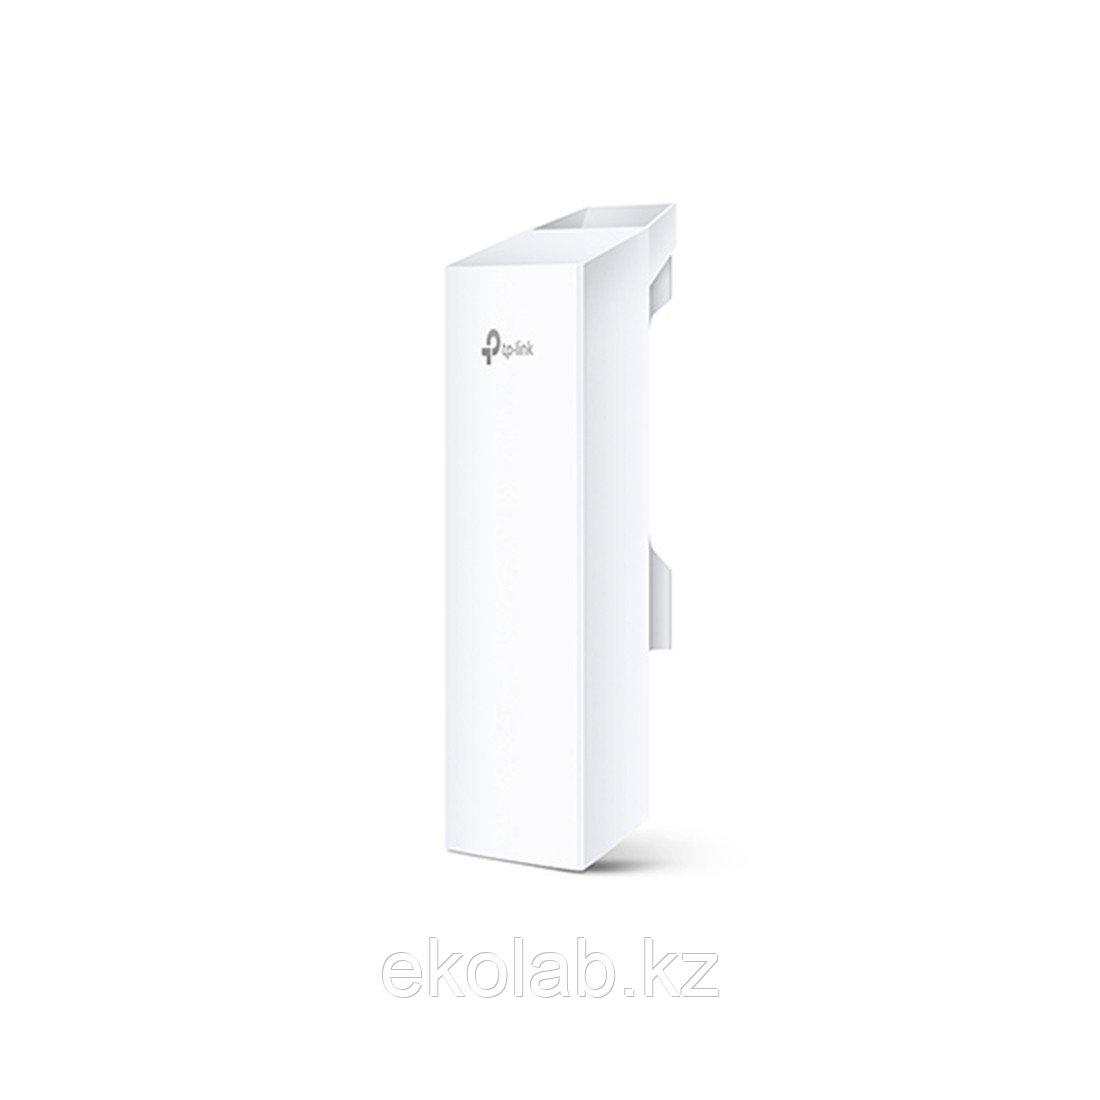 Wi-Fi точка доступа TP-Link CPE210